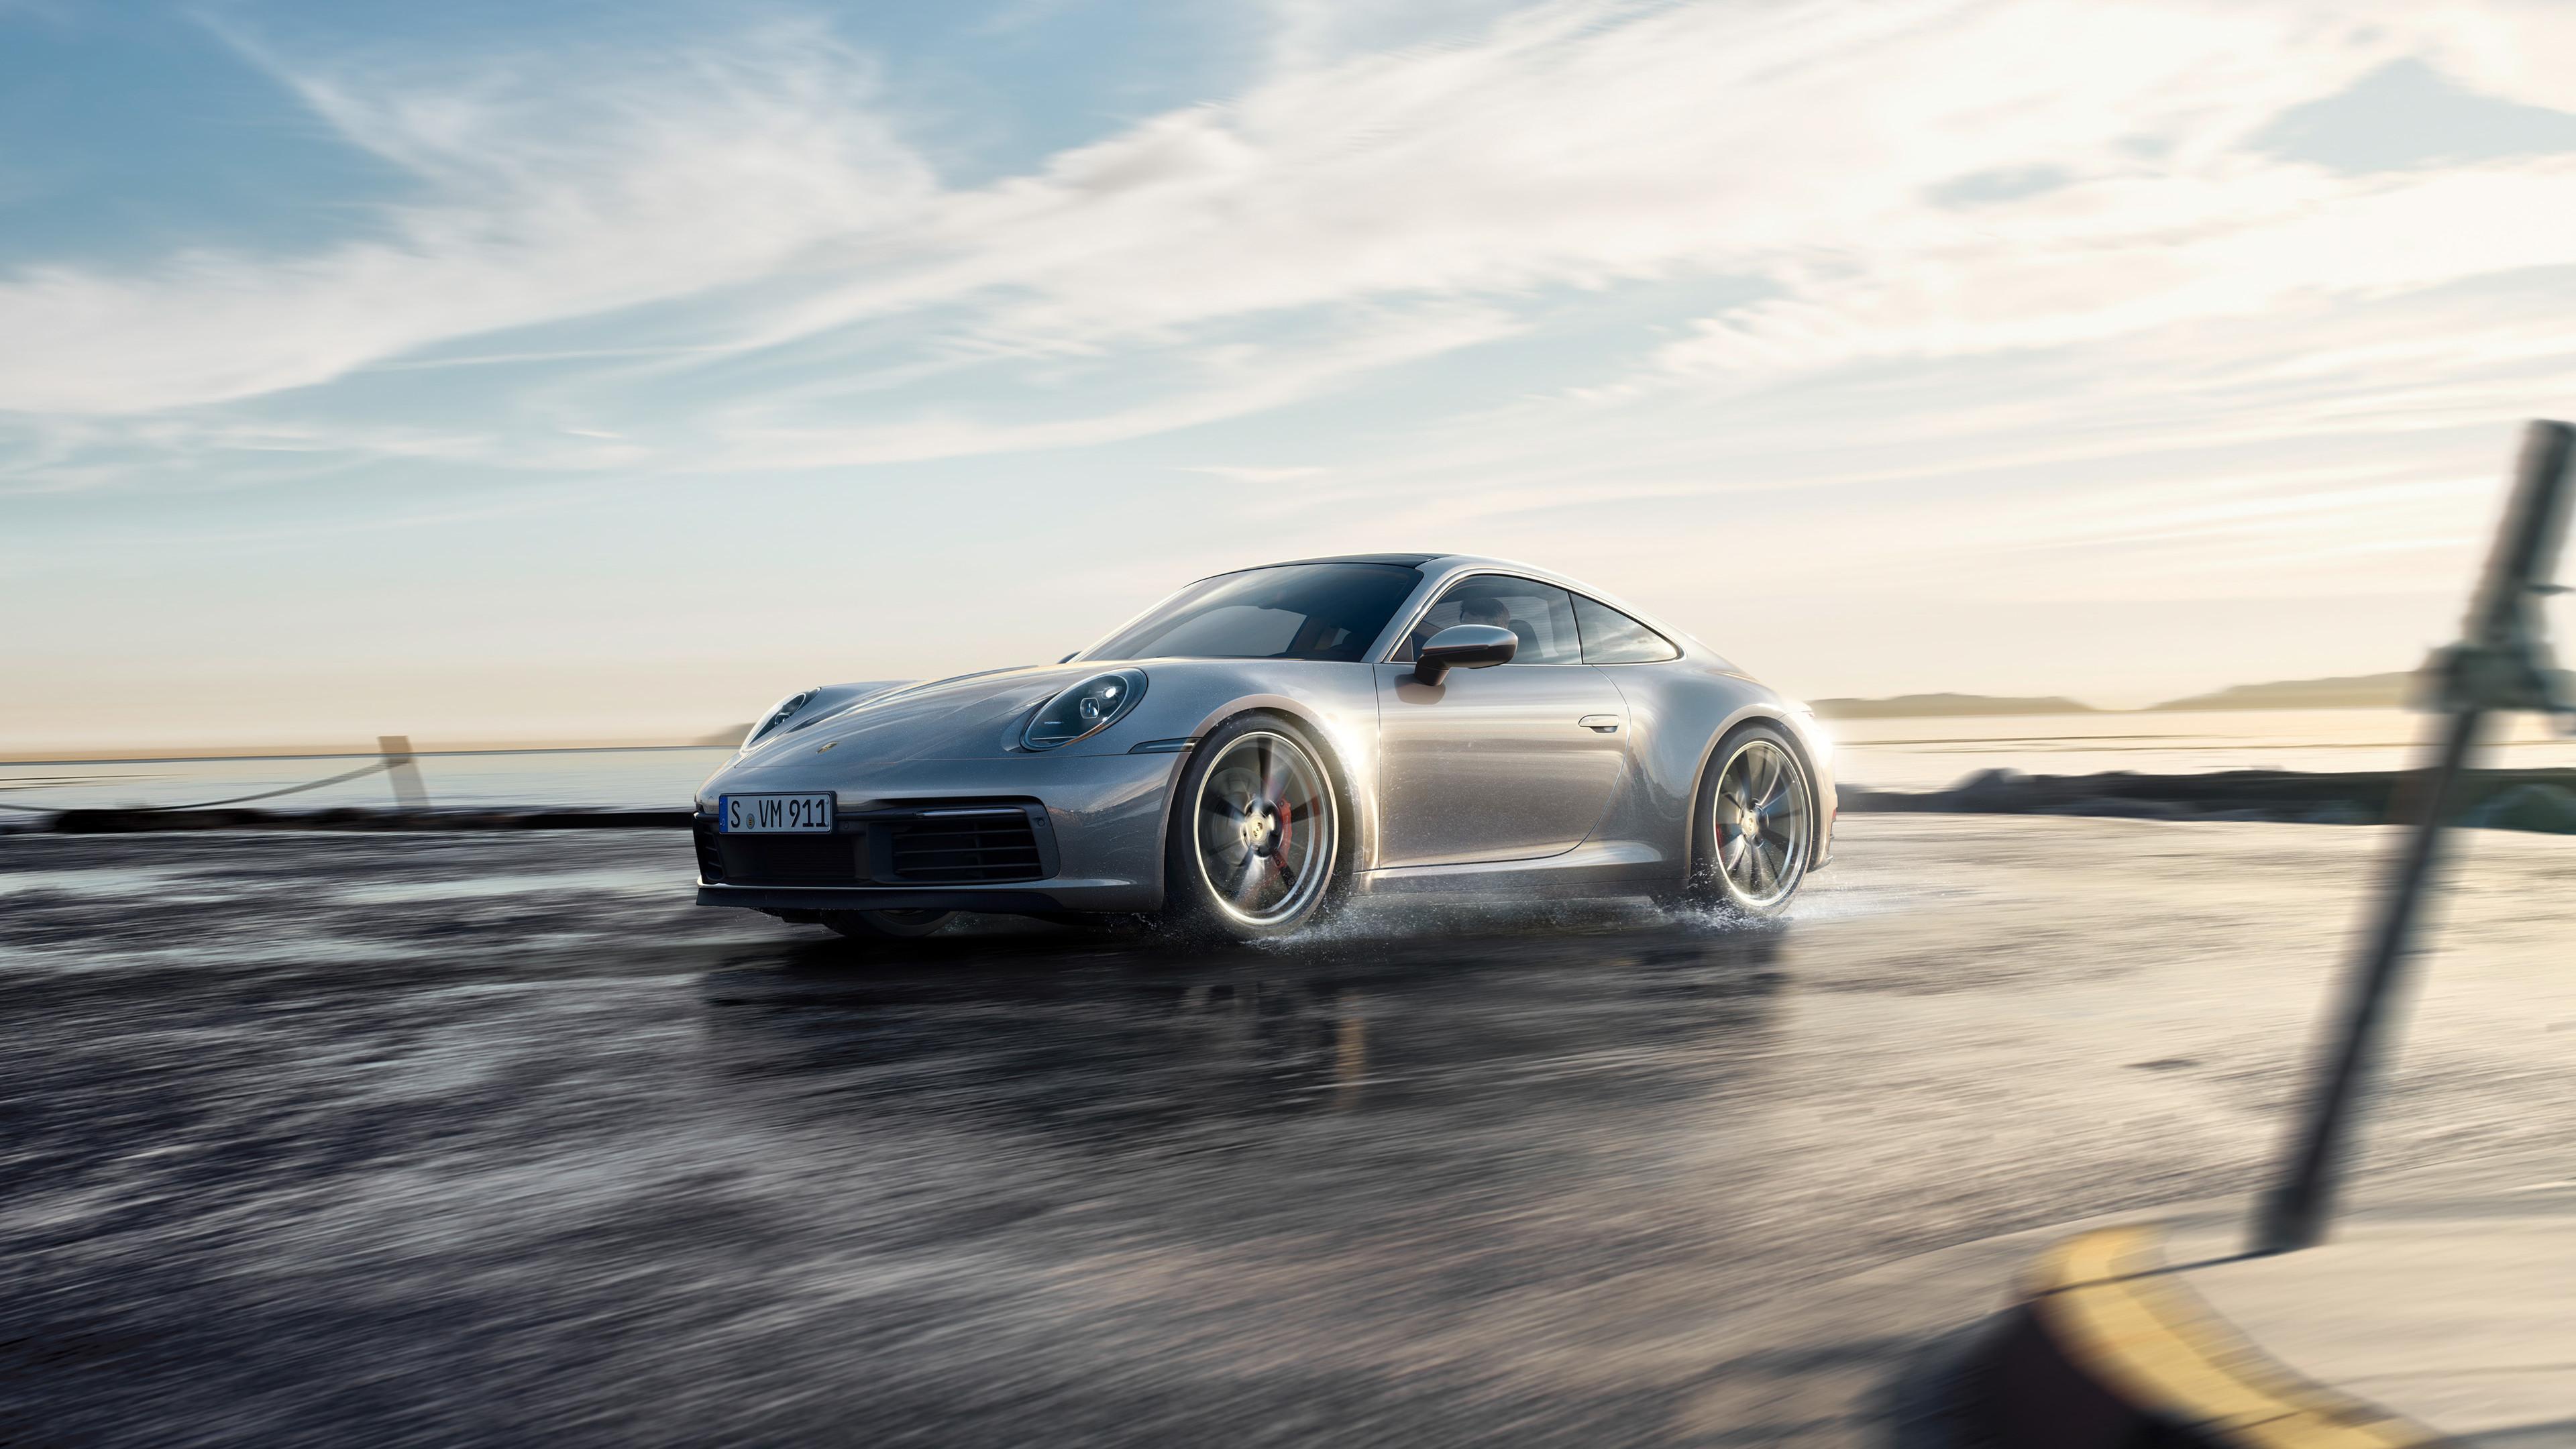 king of sportscars porsche 911 4k 1547937304 - King Of Sportscars Porsche 911 4k - porsche wallpapers, porsche 911 wallpapers, hd-wallpapers, cars wallpapers, behance wallpapers, 4k-wallpapers, 2018 cars wallpapers